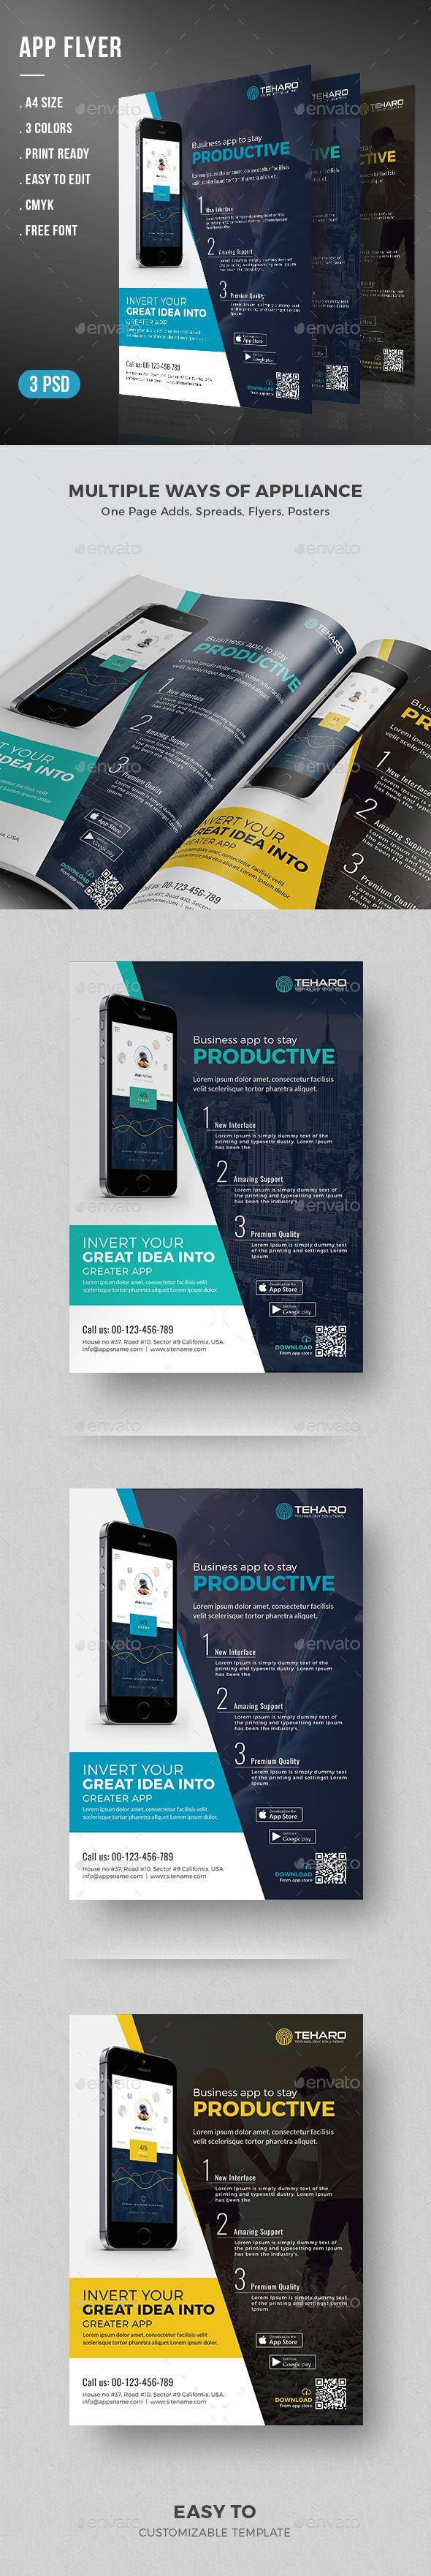 Poster design app android - Mobile App Flyer